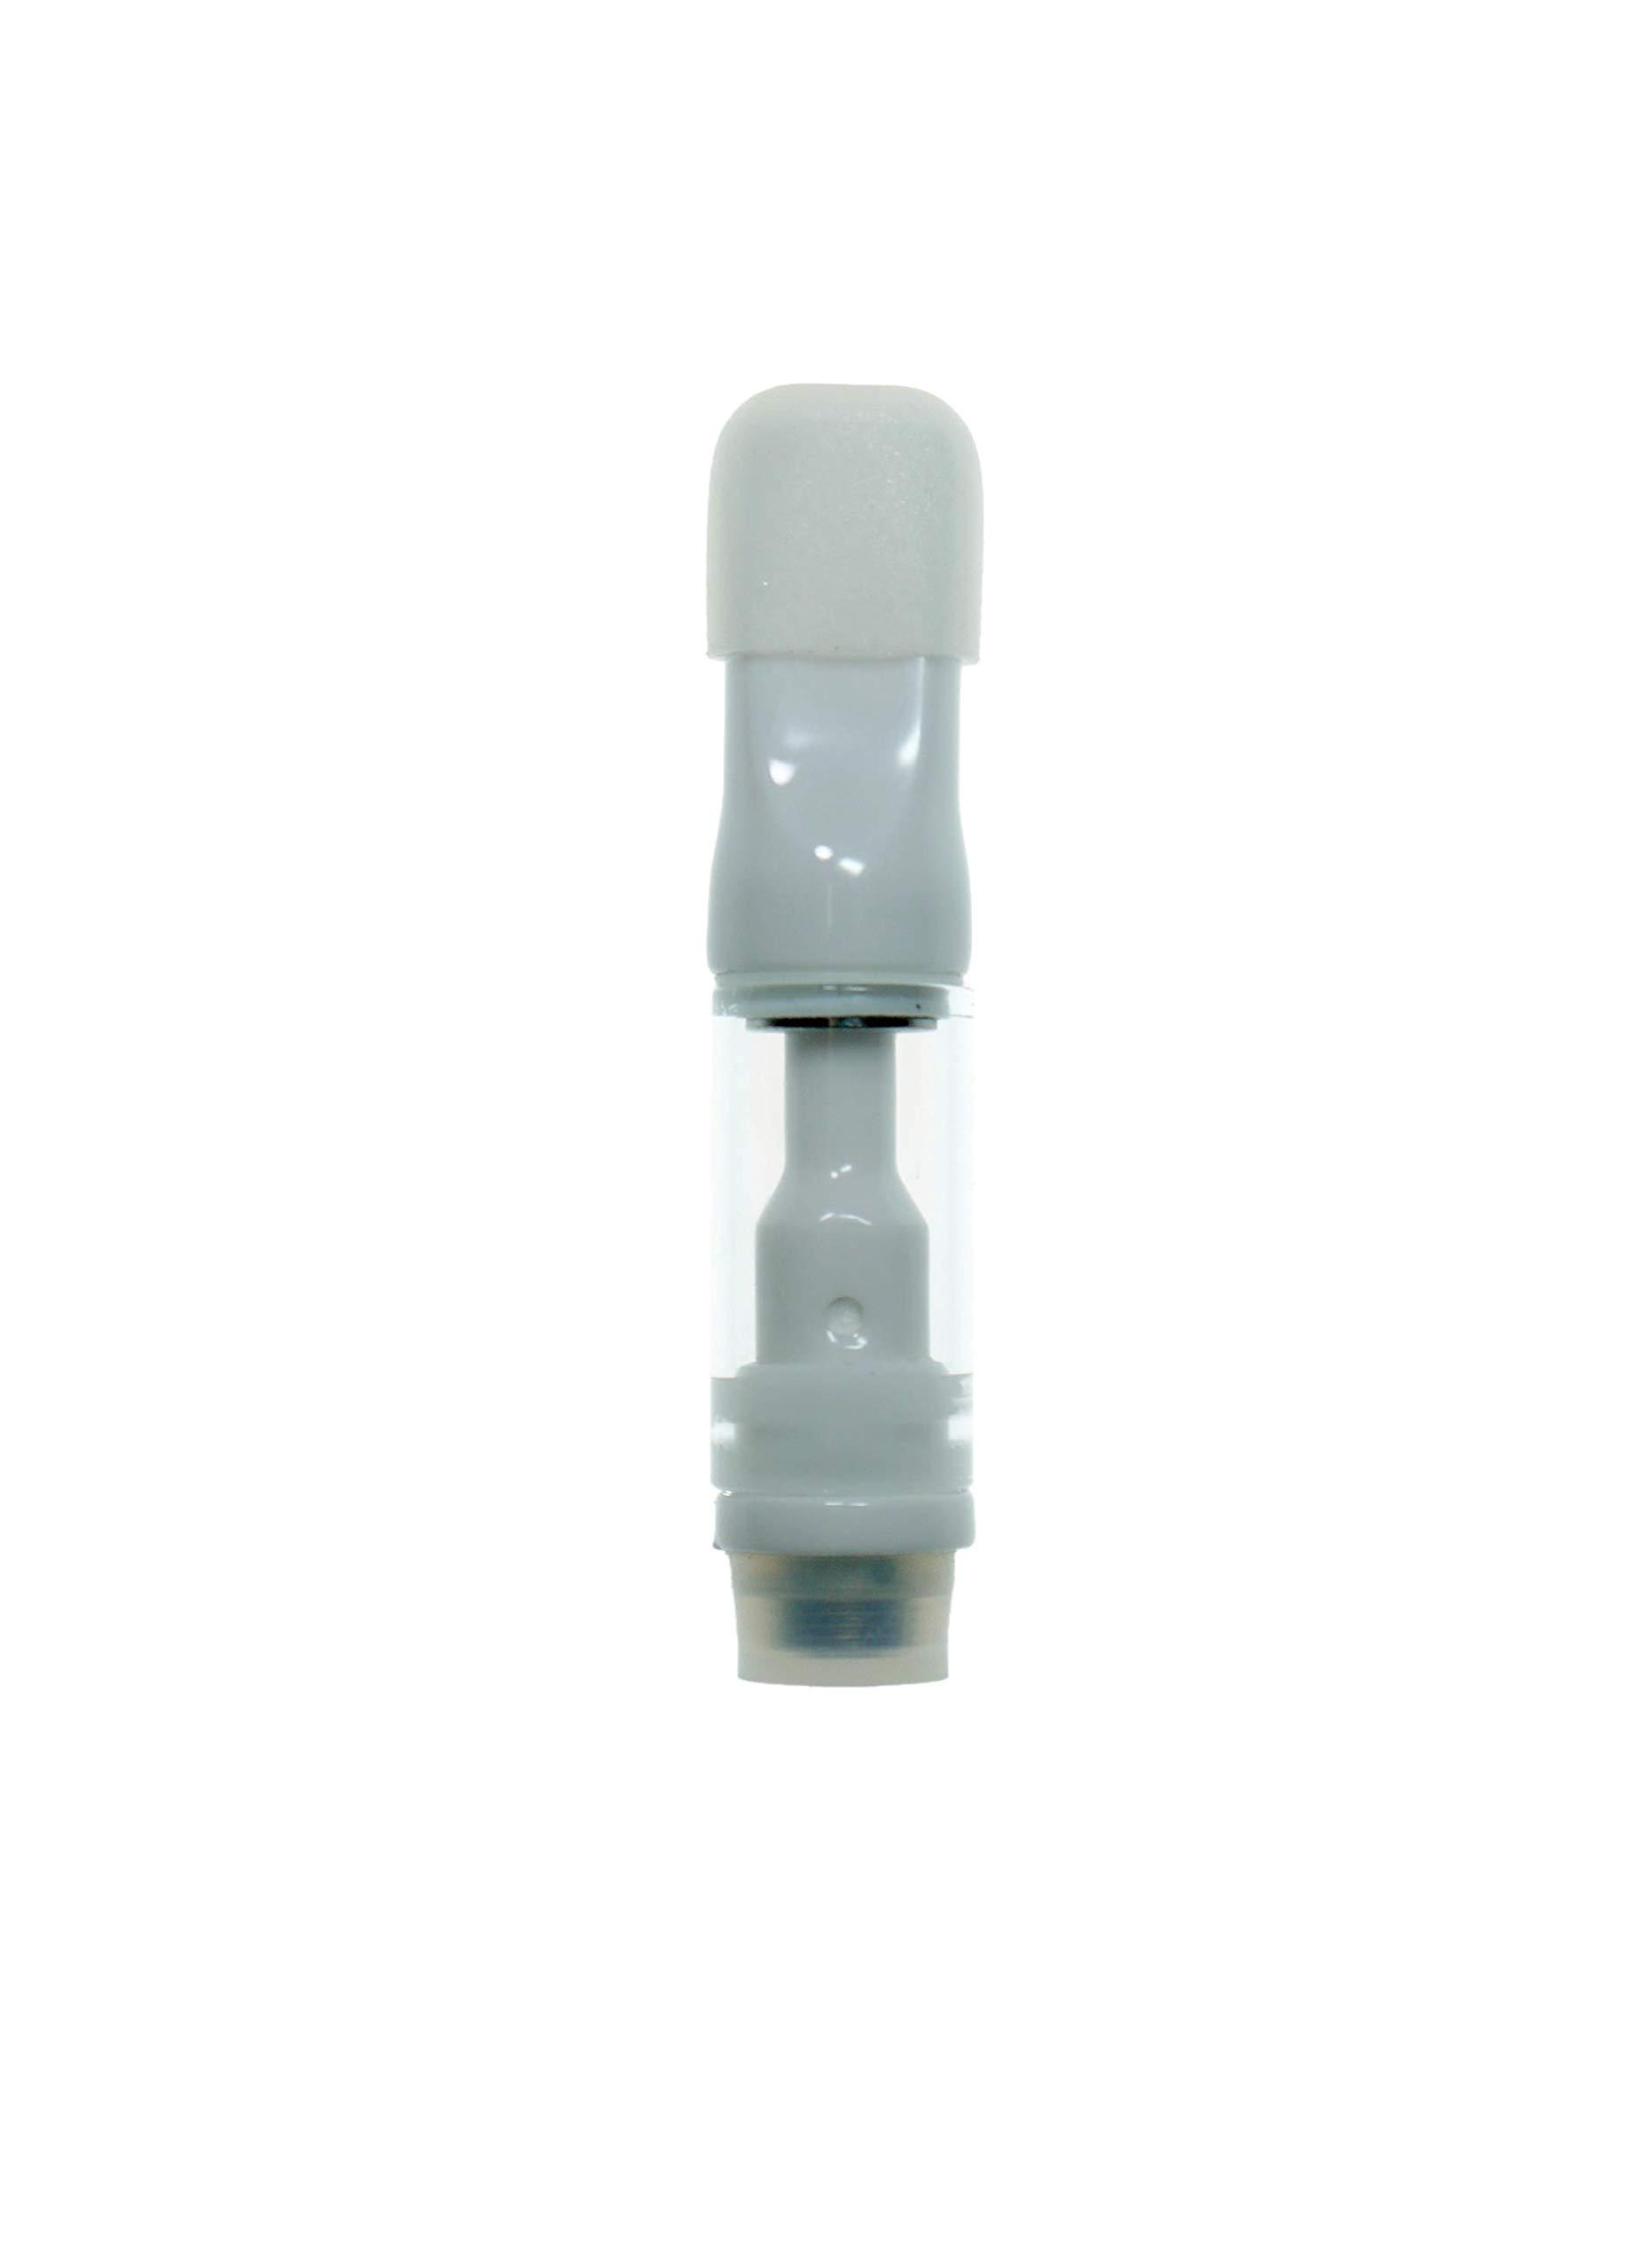 SC6 Eco Cartridge 0.5ml White Ceramic (100 Units) by YGreen